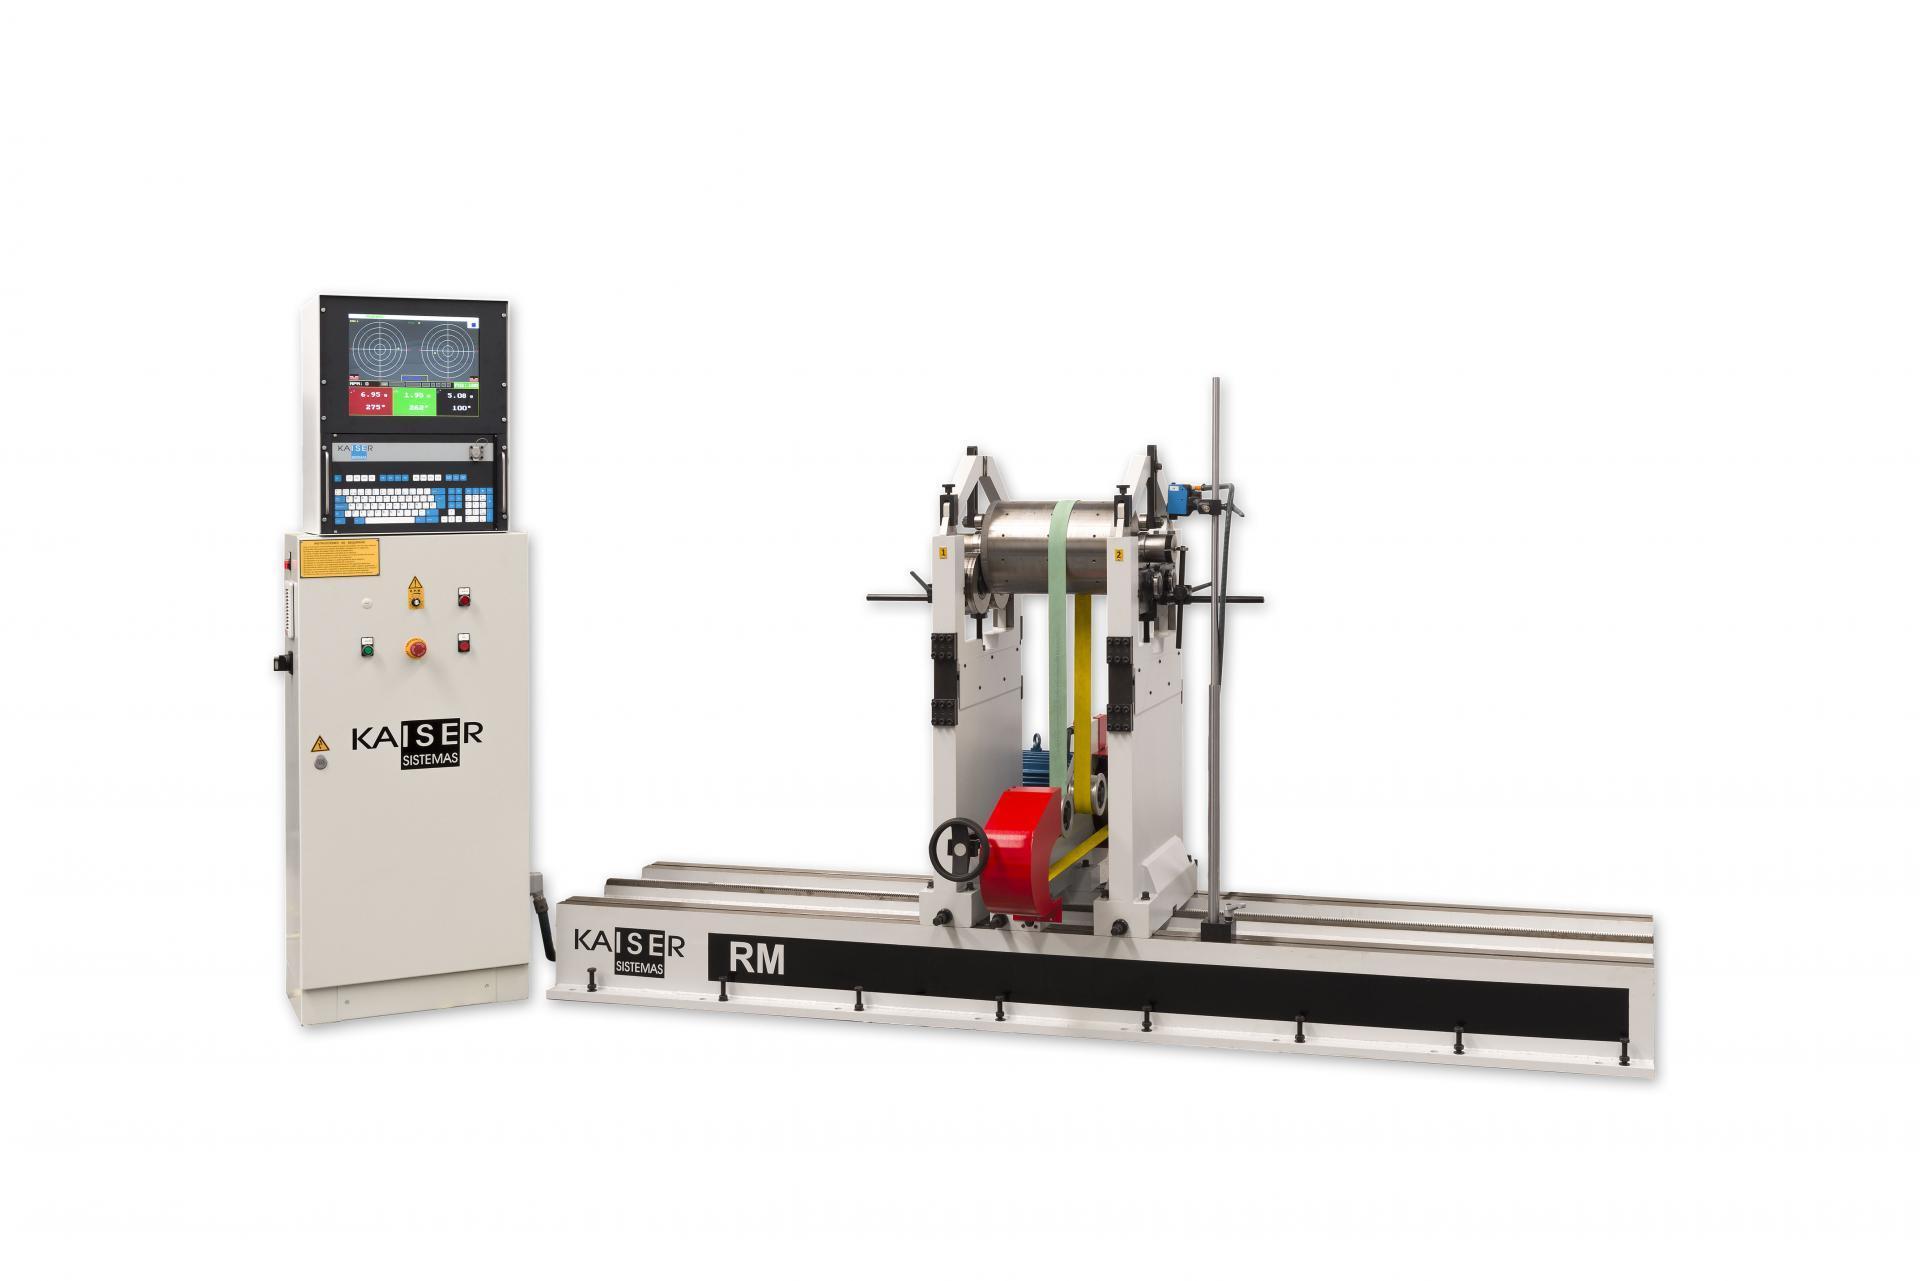 REF 11 - MODEL RM3000-4500.1 HORIZONTAL BALANCING MACHINE